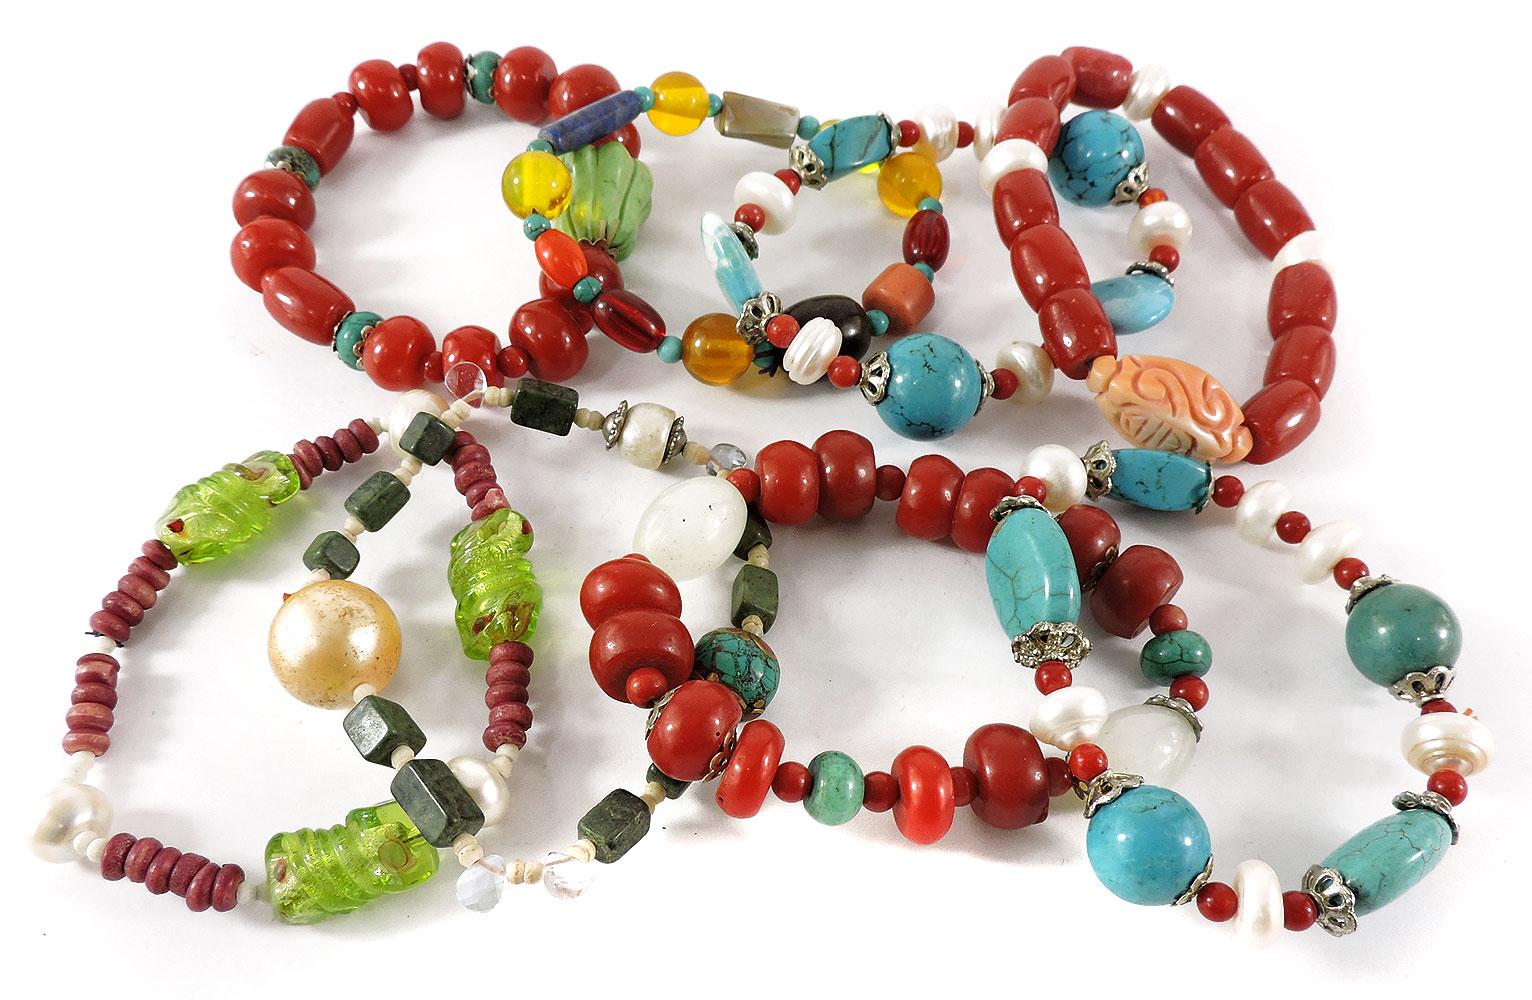 8 Tibetan Bracelets Turquoise Pearl Glass Silver Wholesale by